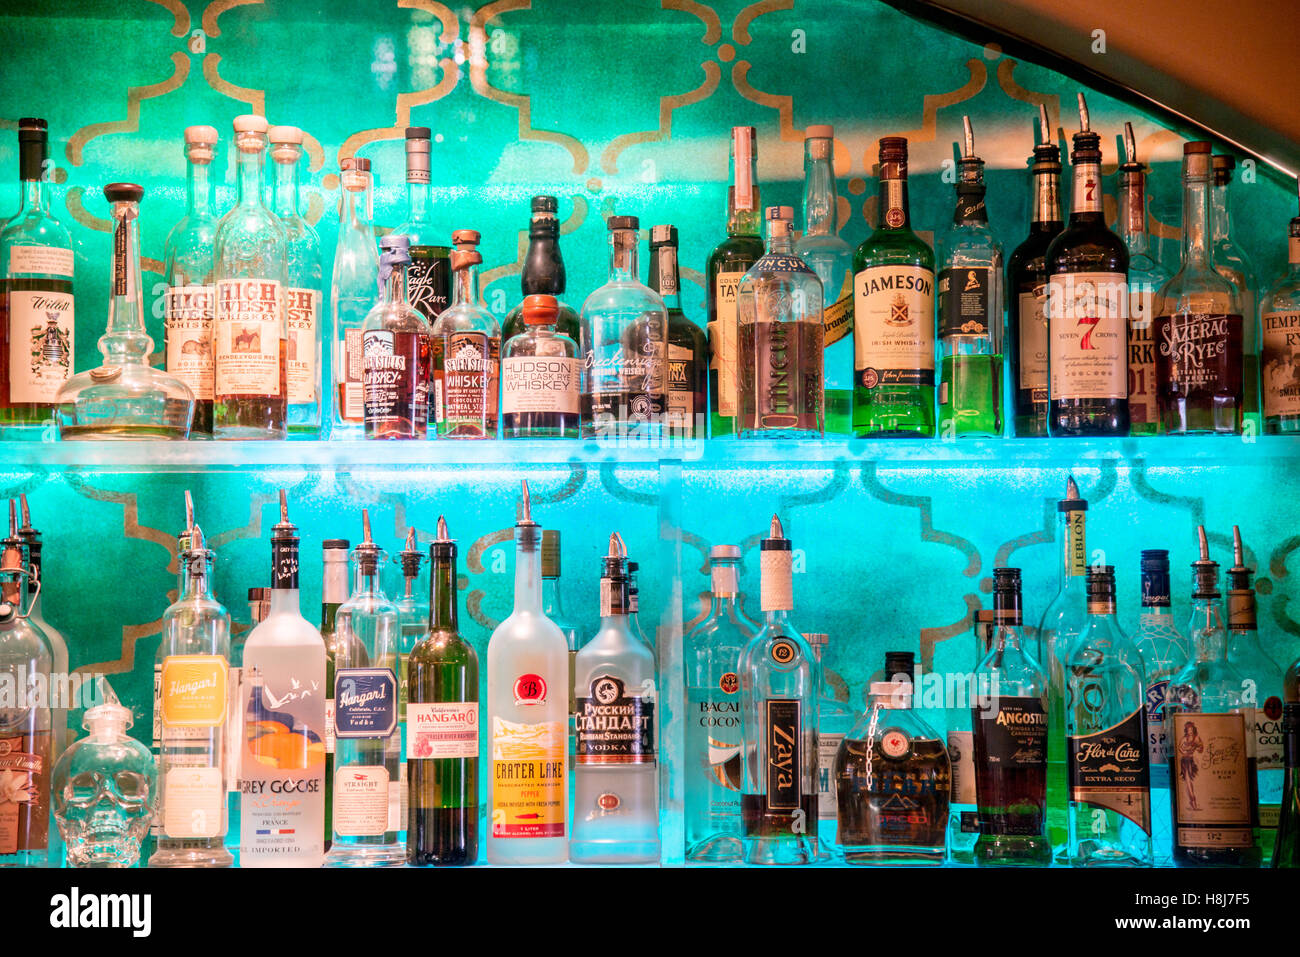 Bar Wall Display of Liquor Bottles Stock Photo: 125790873 - Alamy